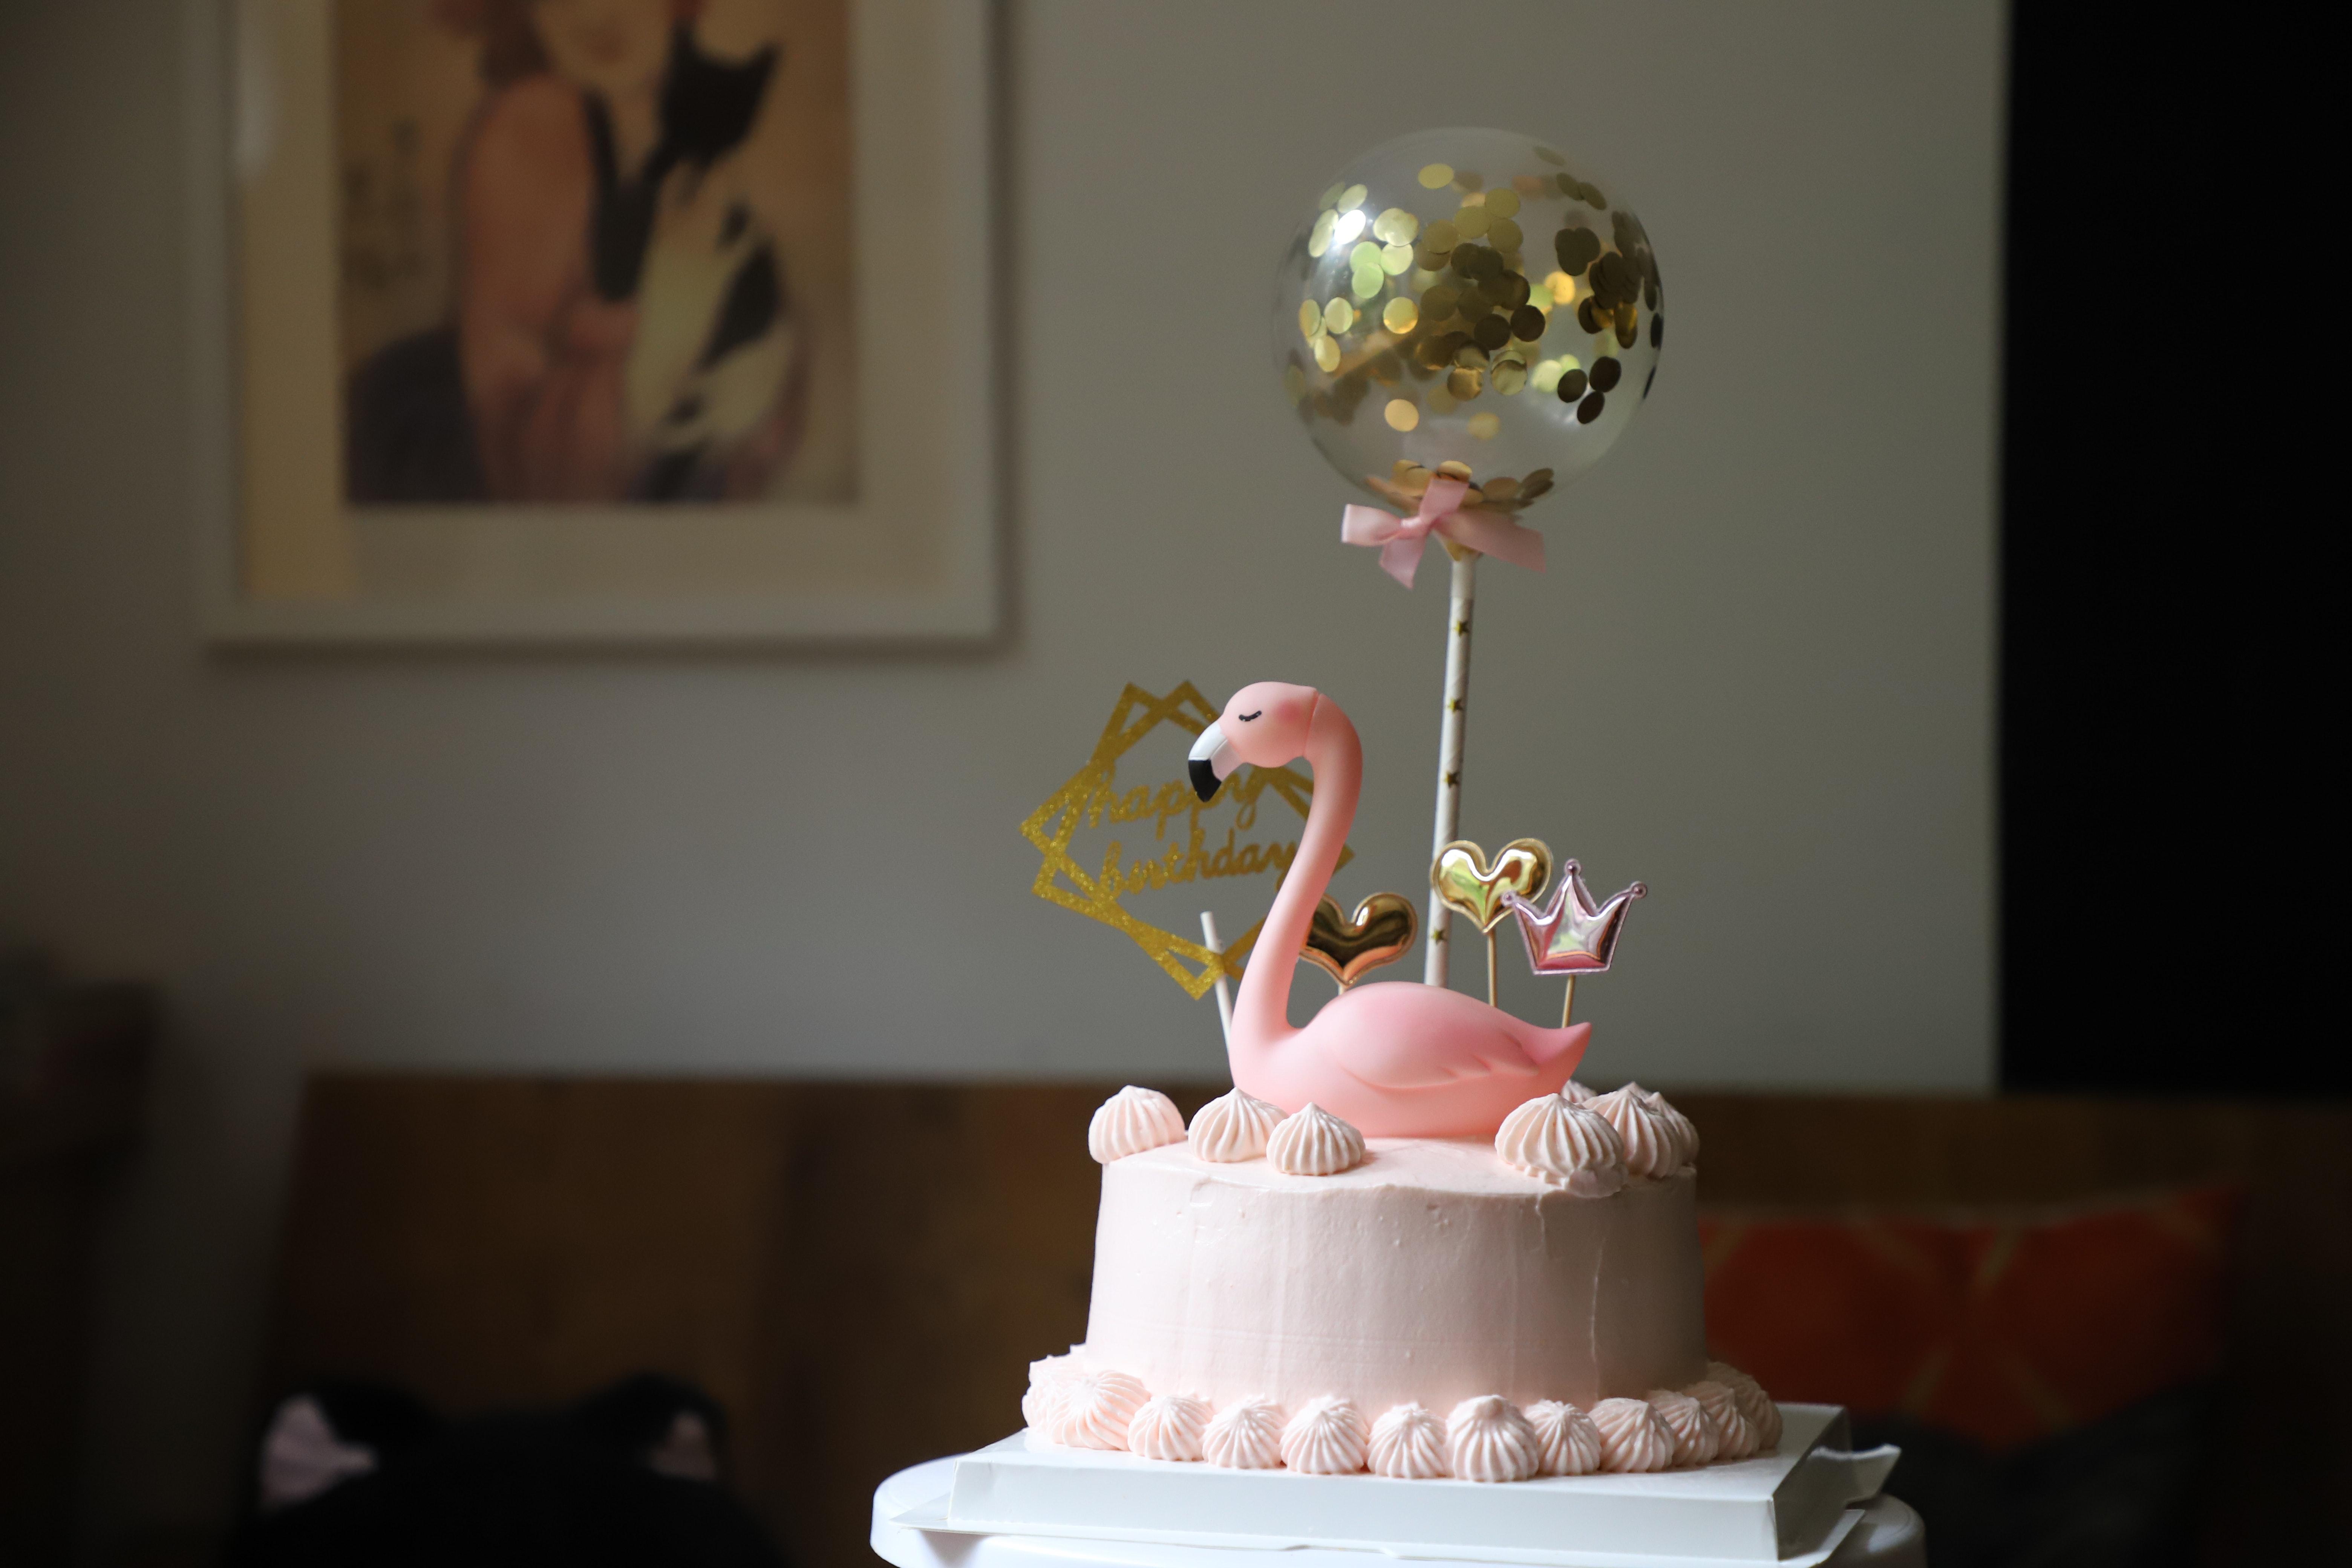 250 Amazing Birthday Cake Photos Pexels Free Stock Photos